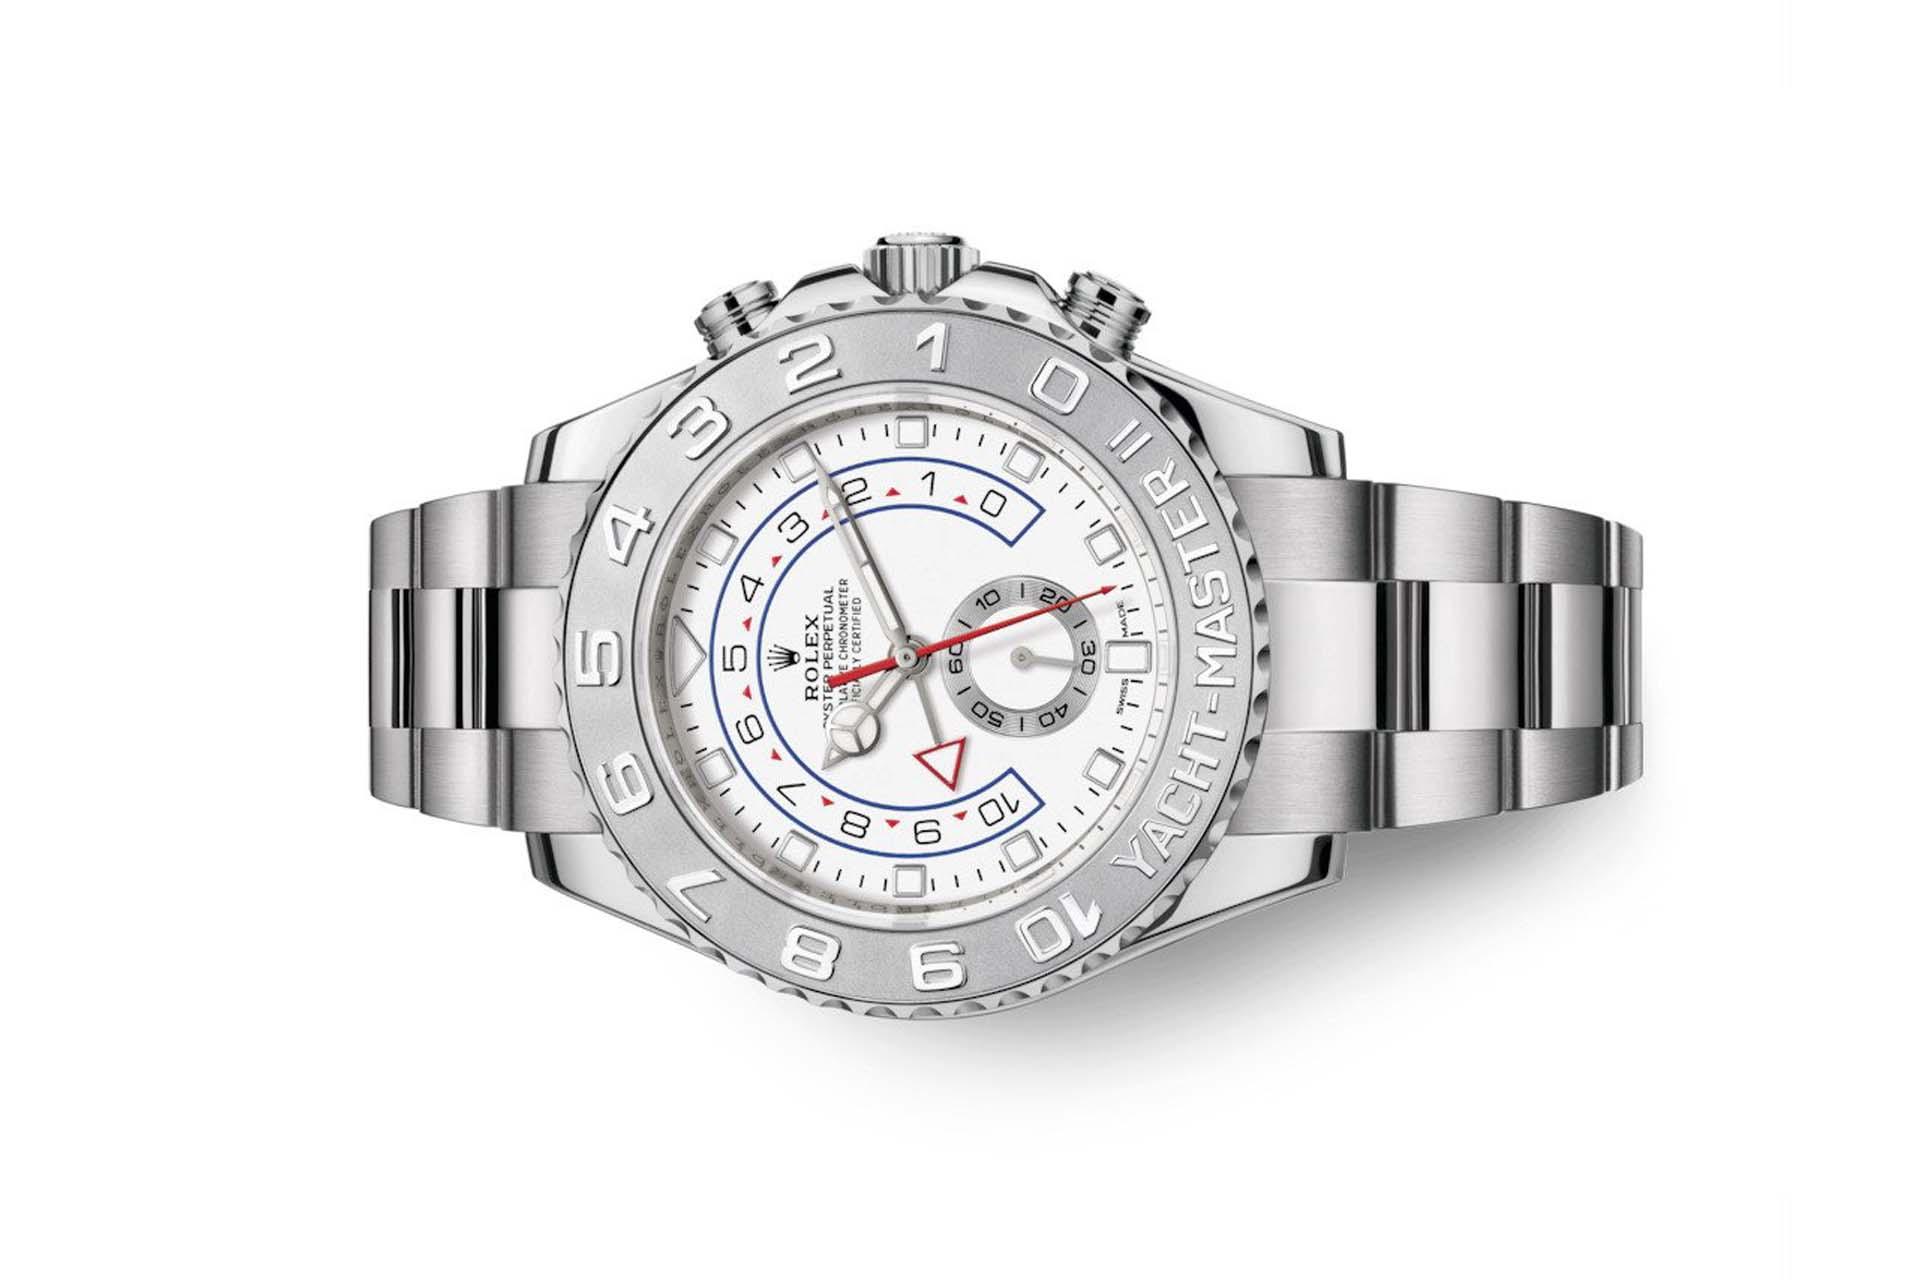 Đồng hồ Rolex Yacht-Master II 116689-0002 Mặt Số Trắng